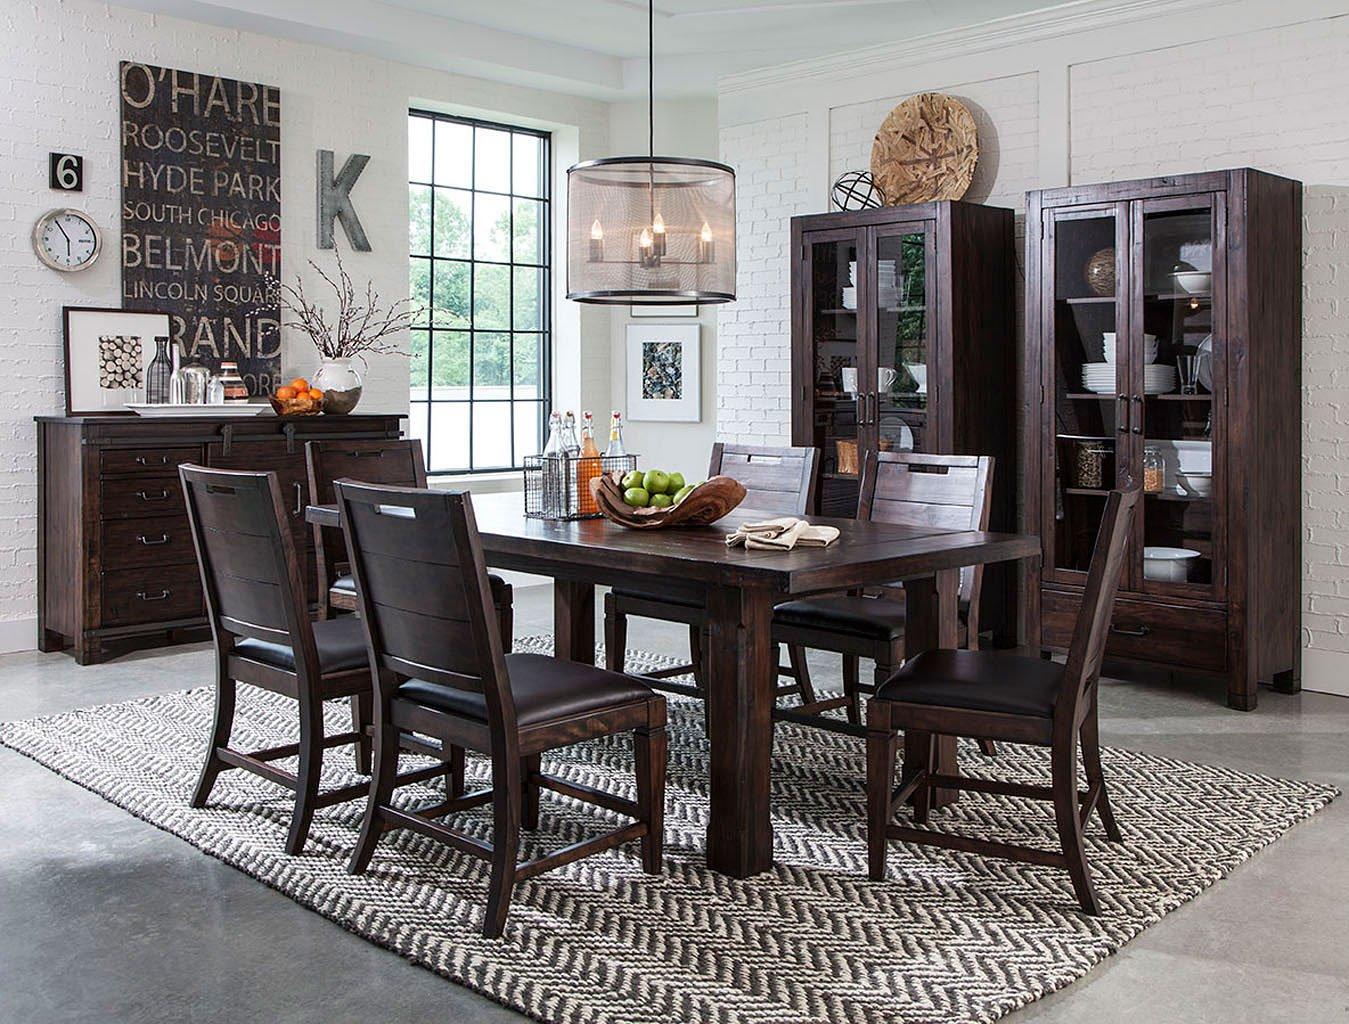 Pine Hill Dining Room Set Magnussen 1 Reviews Furniture